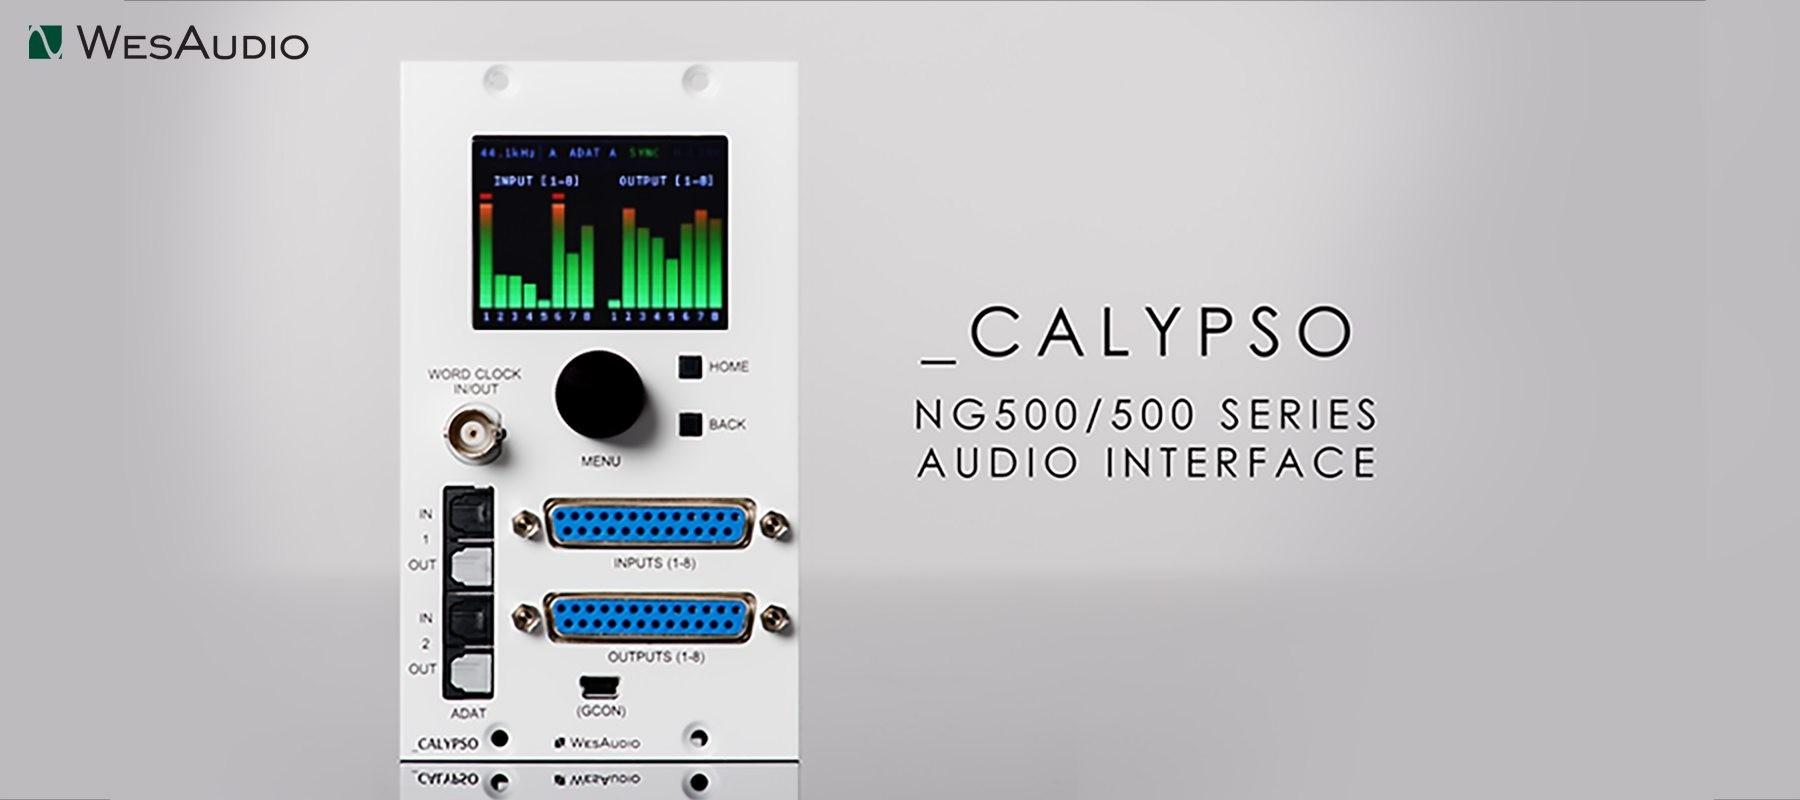 WesAudio CALYPSO